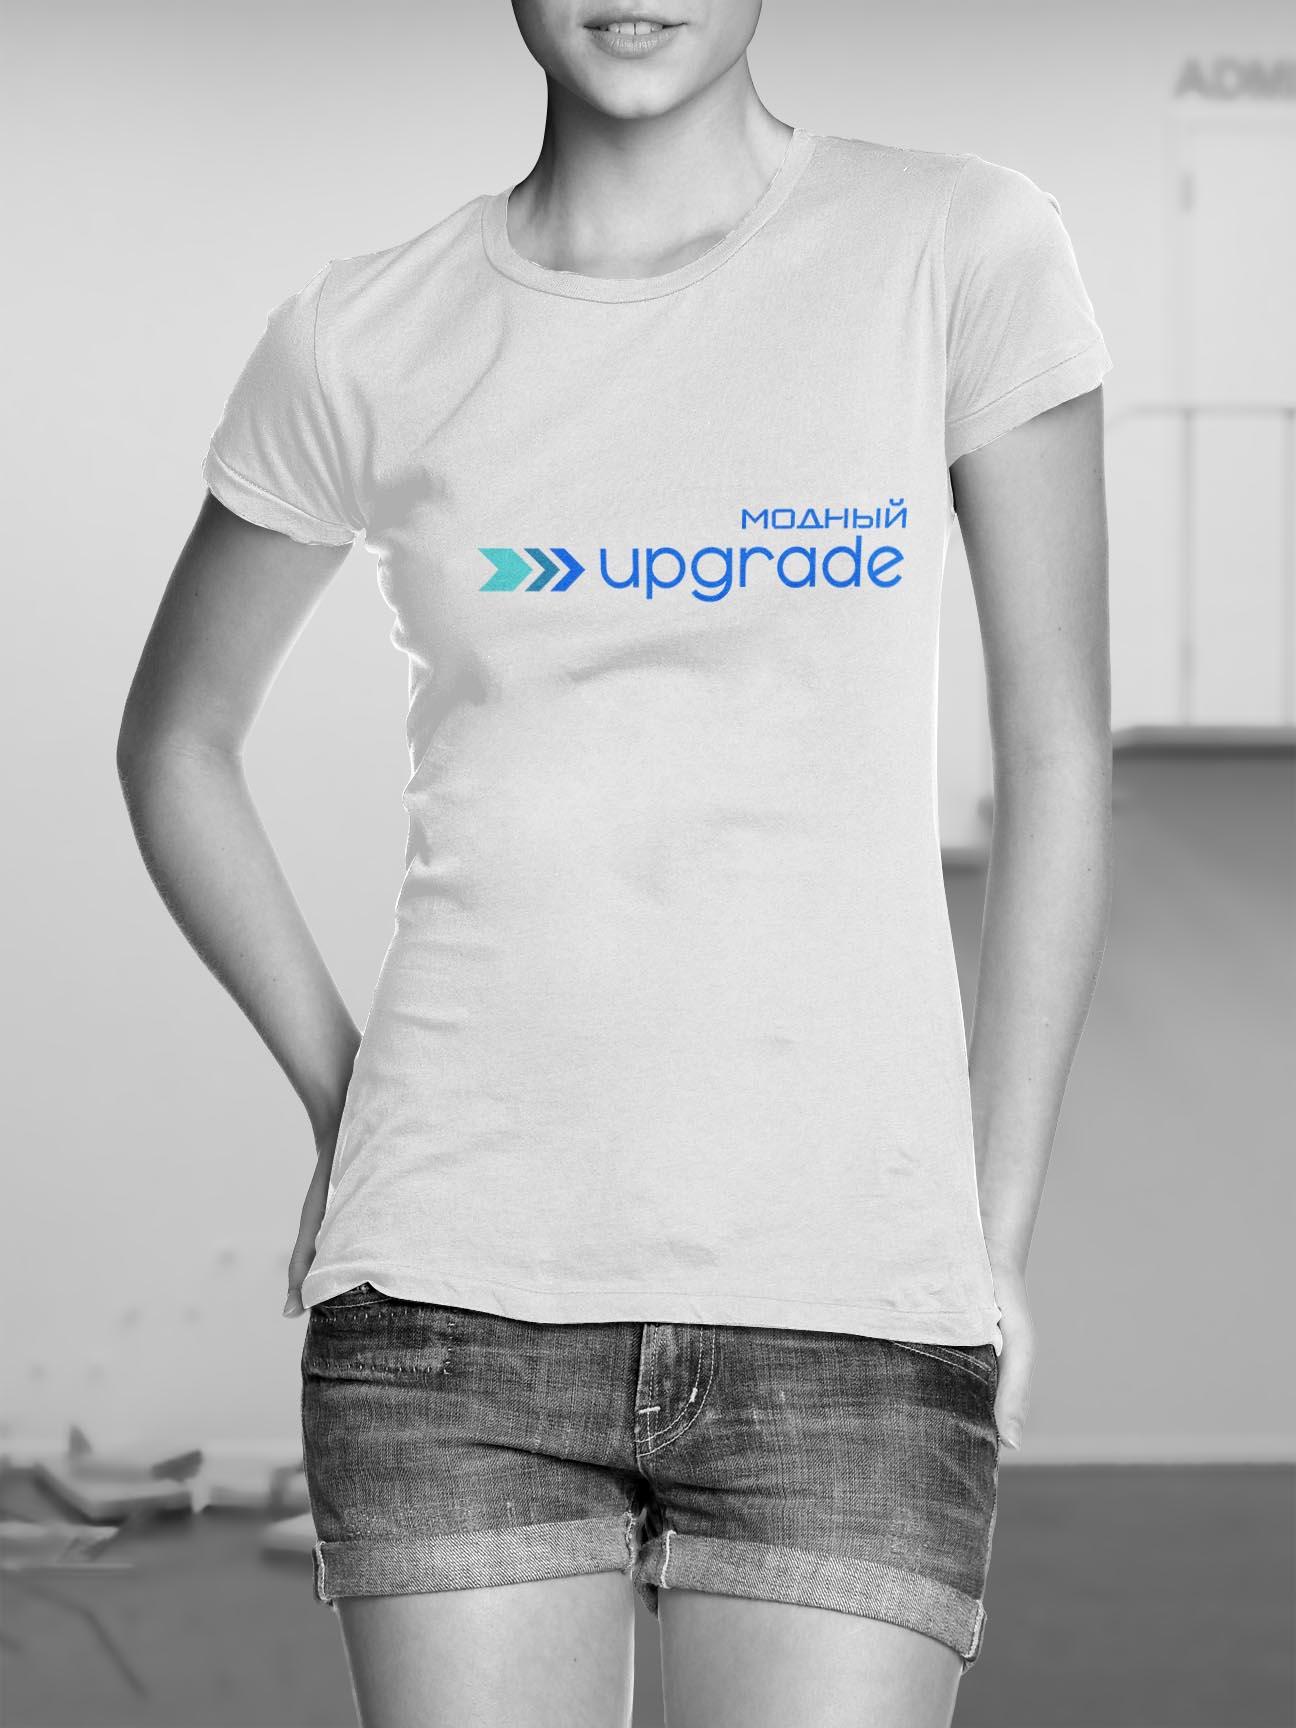 "Логотип интернет магазина ""Модный UPGRADE"" фото f_1895945925d3543e.jpg"